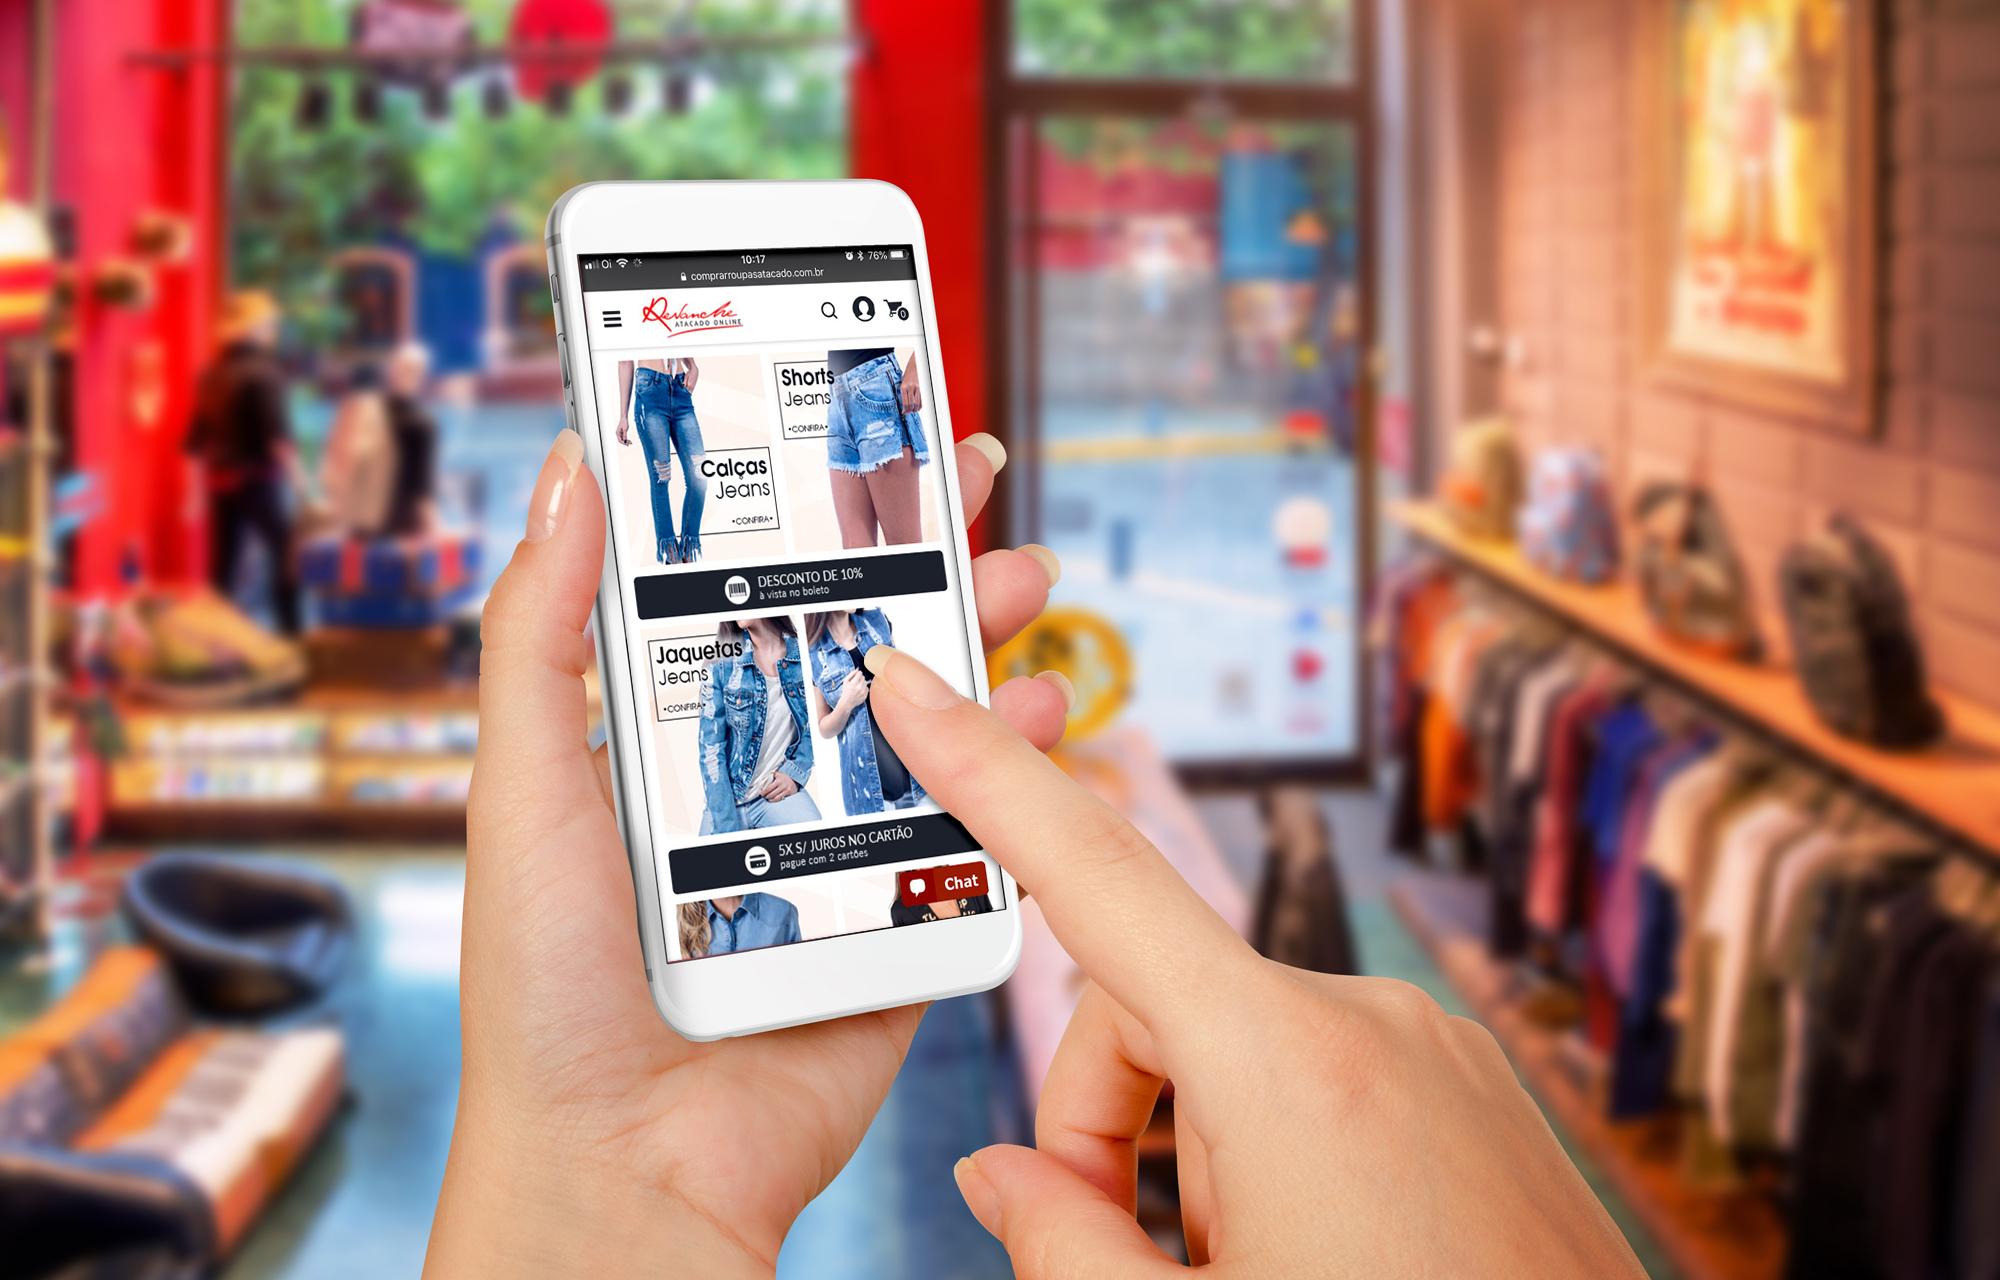 cfff11dea7830b Economize comprando no atacado de roupas online da Revanche | Blog Comprar  Roupas Atacado